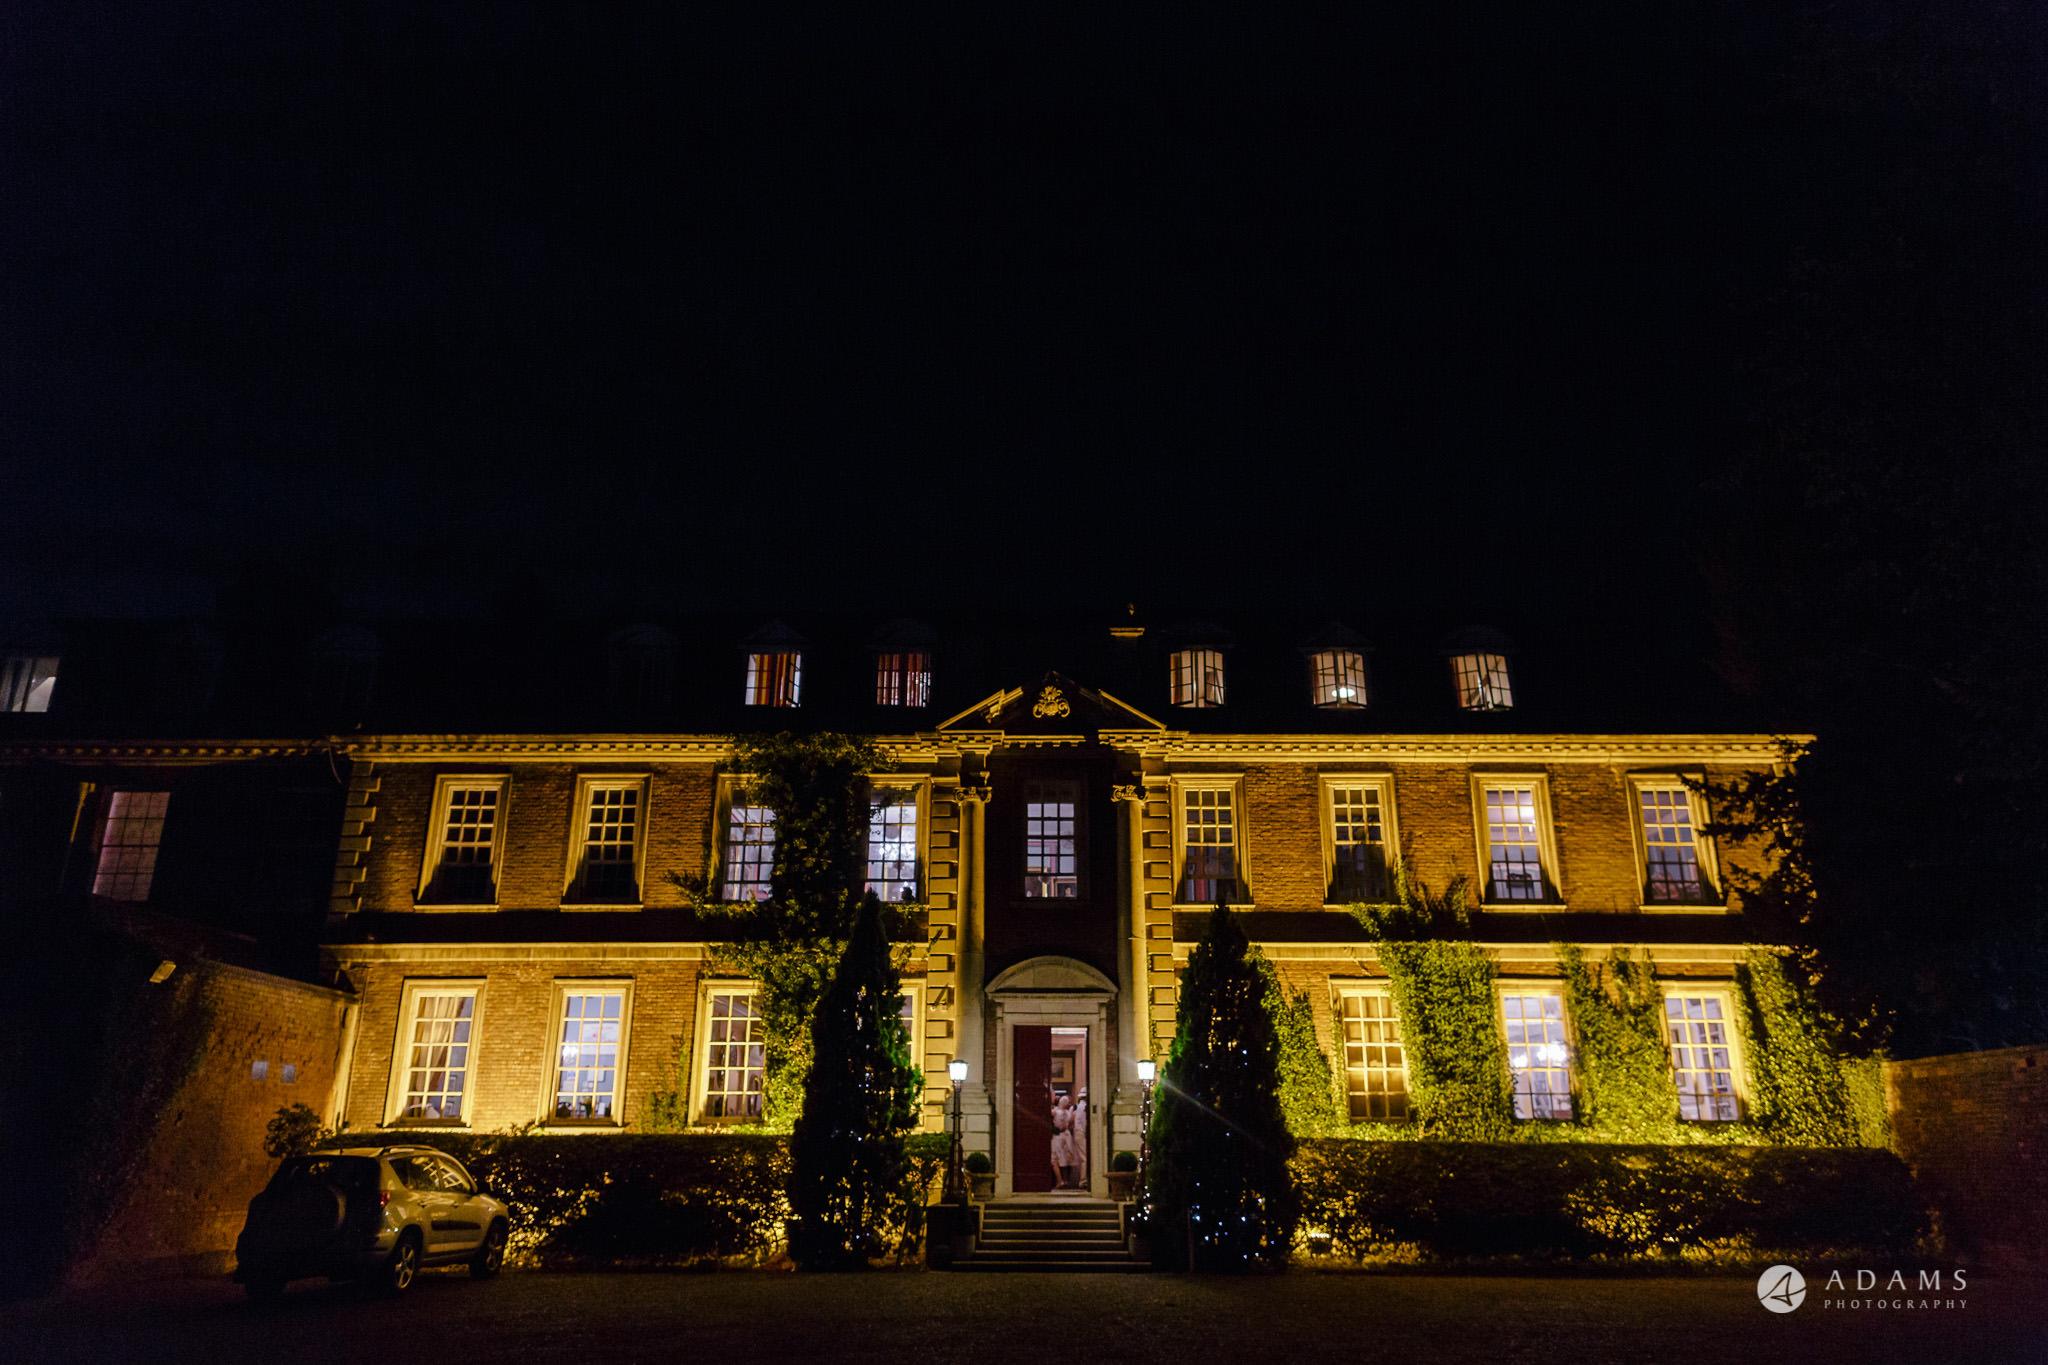 Trinity College Cambridge wedding venue view at night